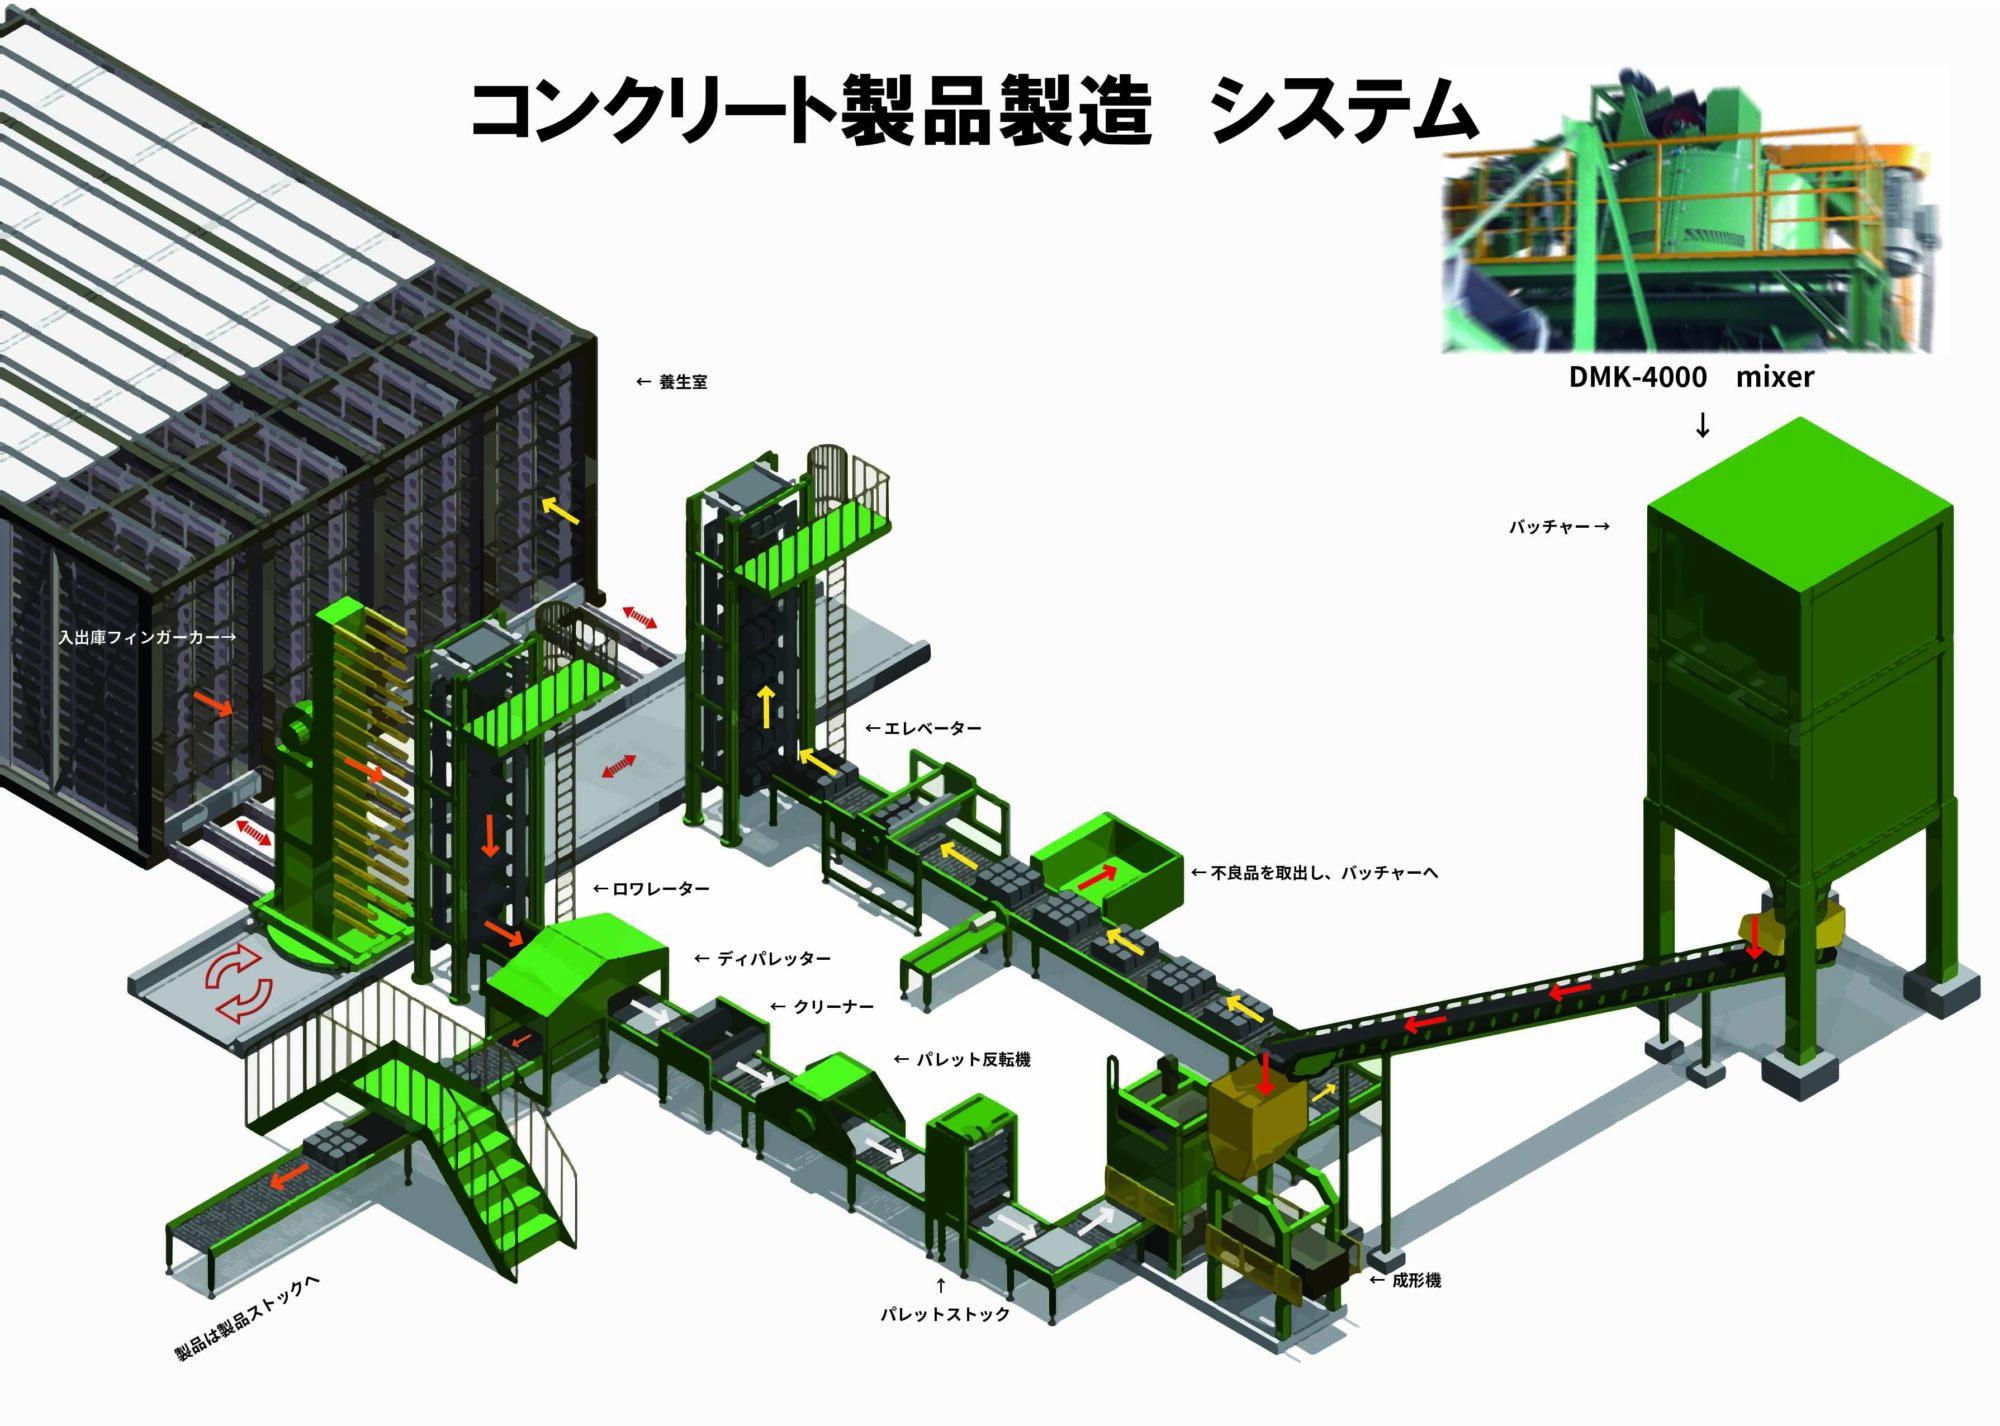 ★DMK鳥観図 20210517 コンクリート製品製造プラント-min